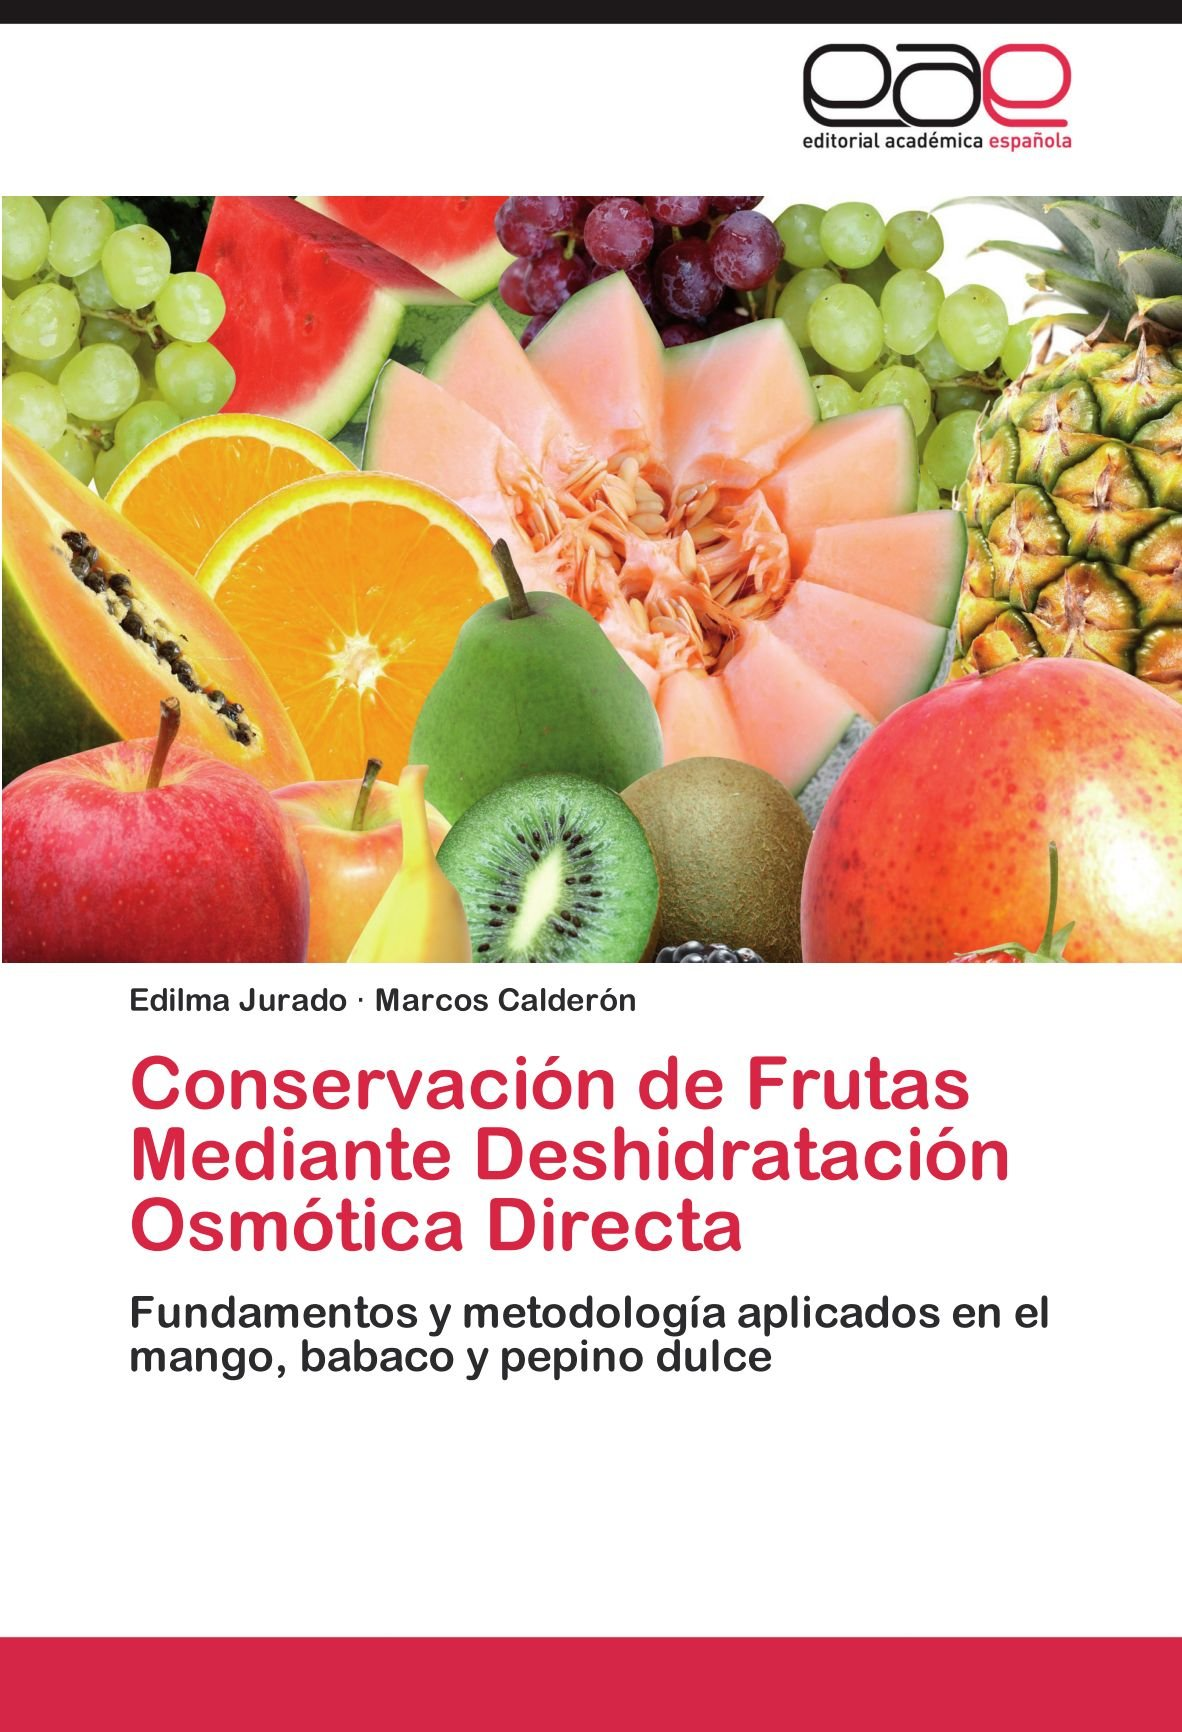 Conservación de Frutas Mediante Deshidratación Osmótica Directa ...